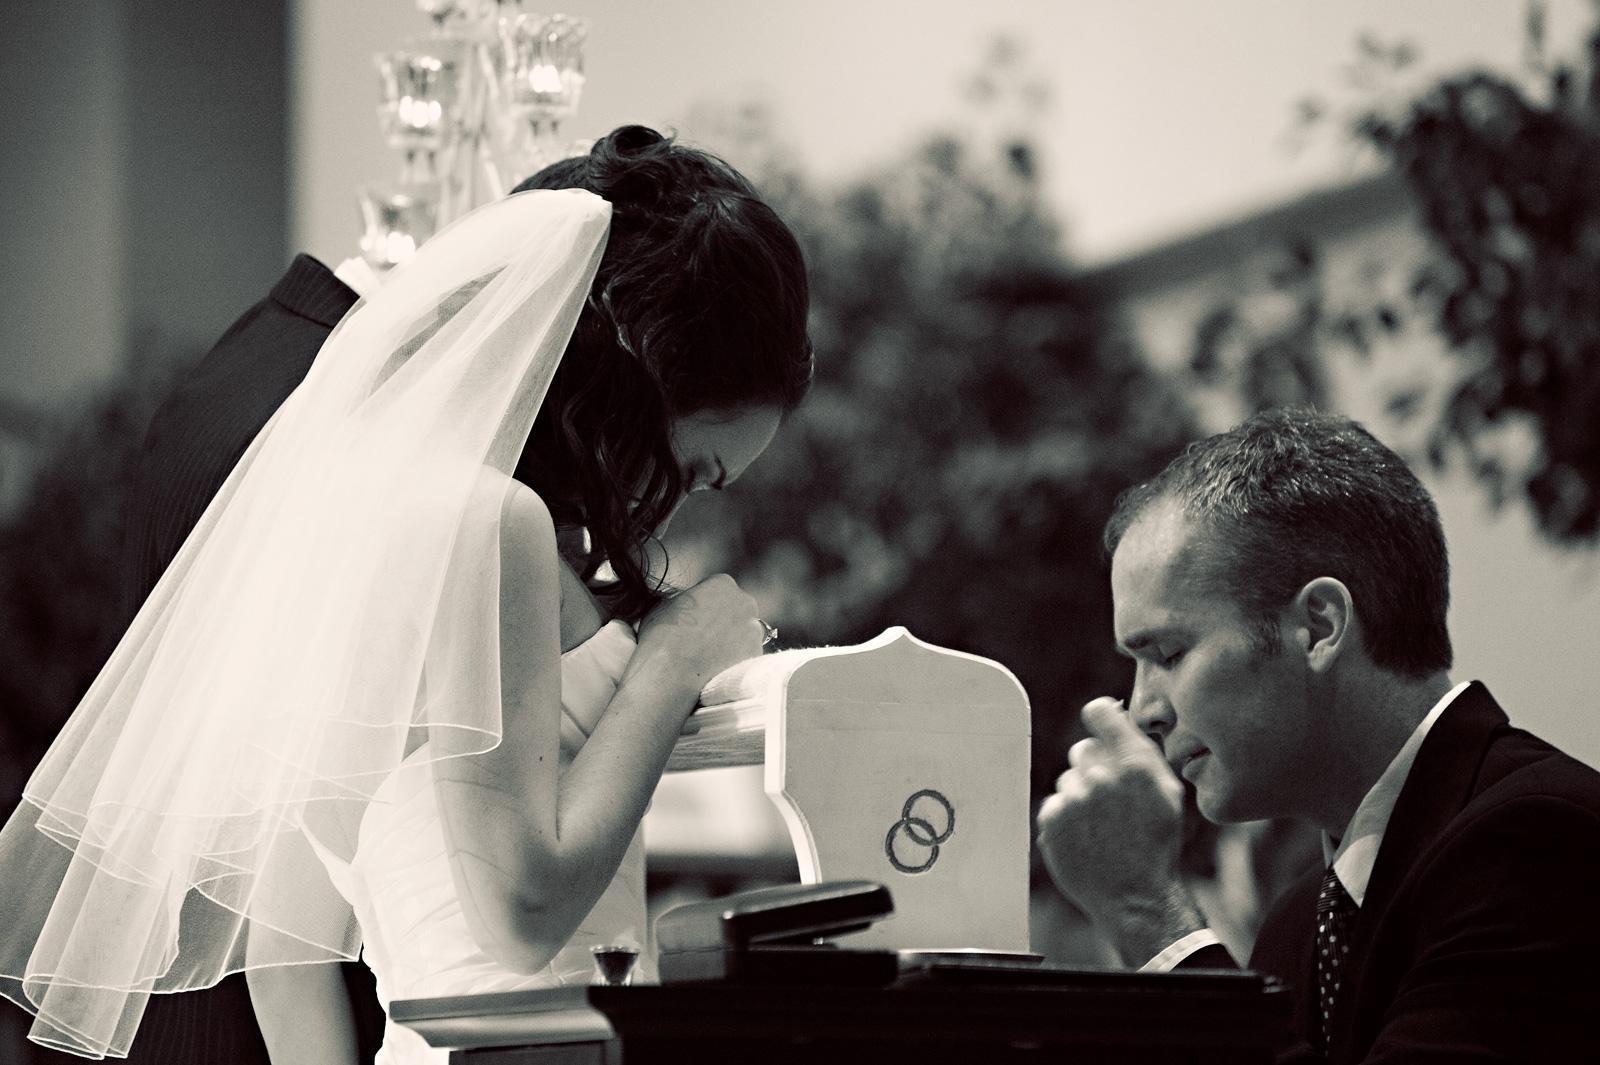 parkwood gospel temple wedding photographer - DSC_8712_1865